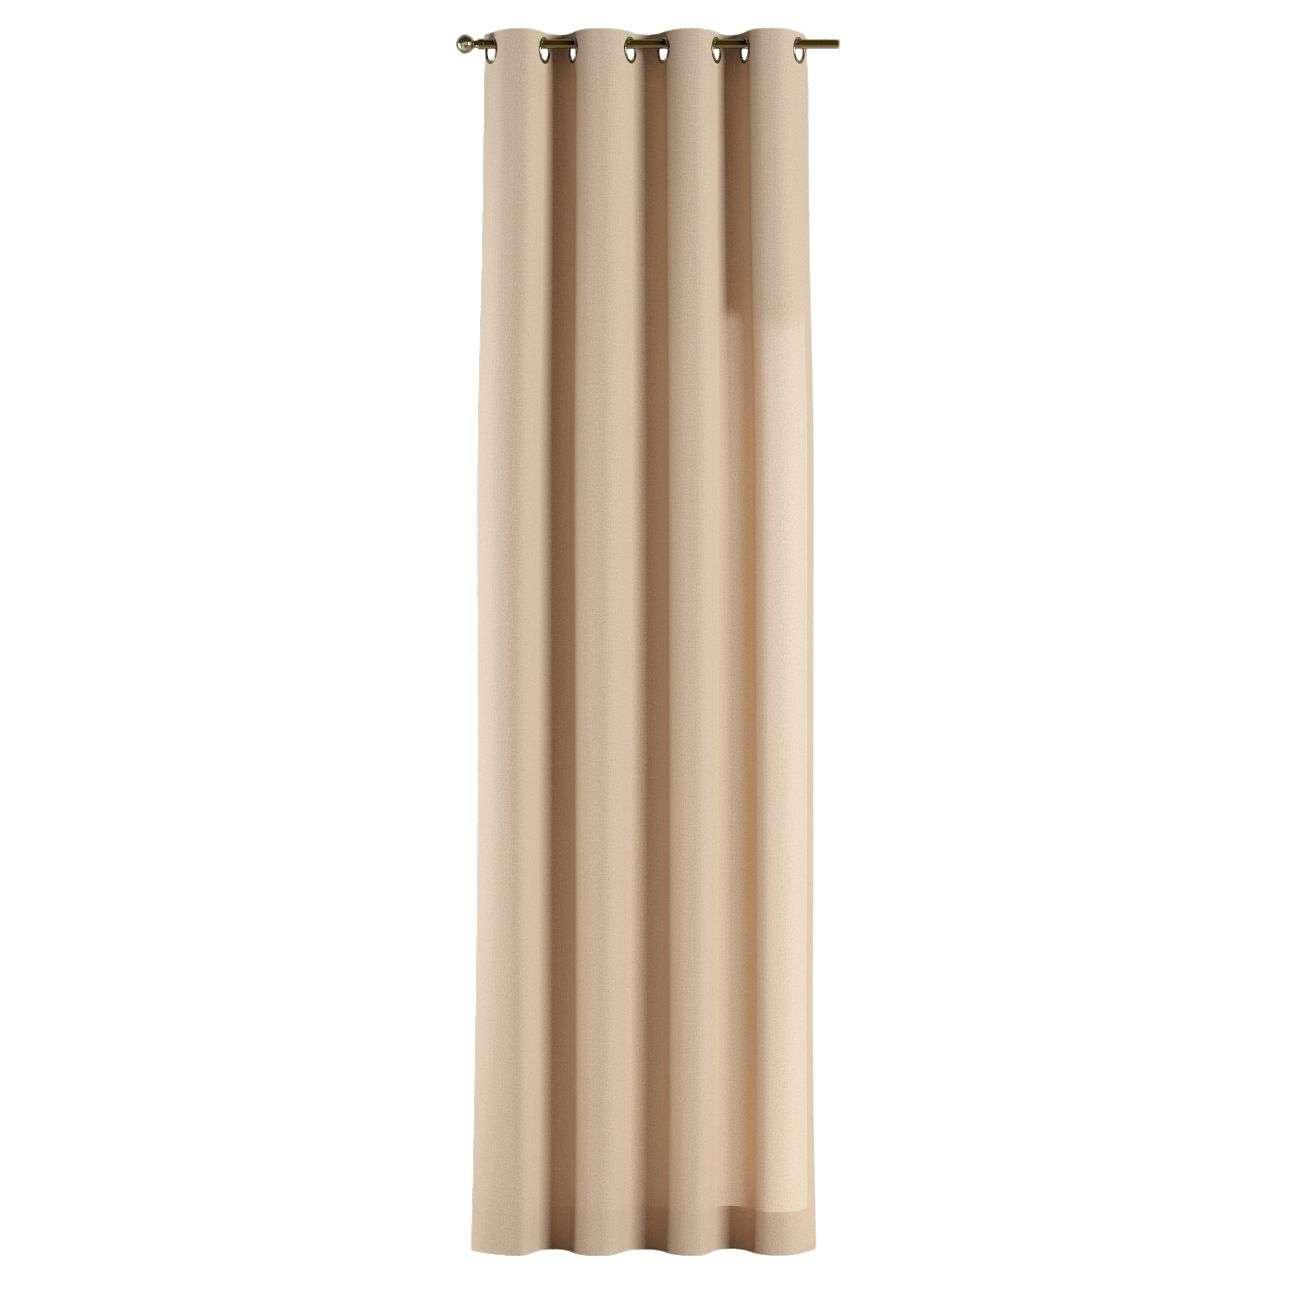 Záves s kolieskami 130 x 260 cm V kolekcii Edinburg, tkanina: 115-78